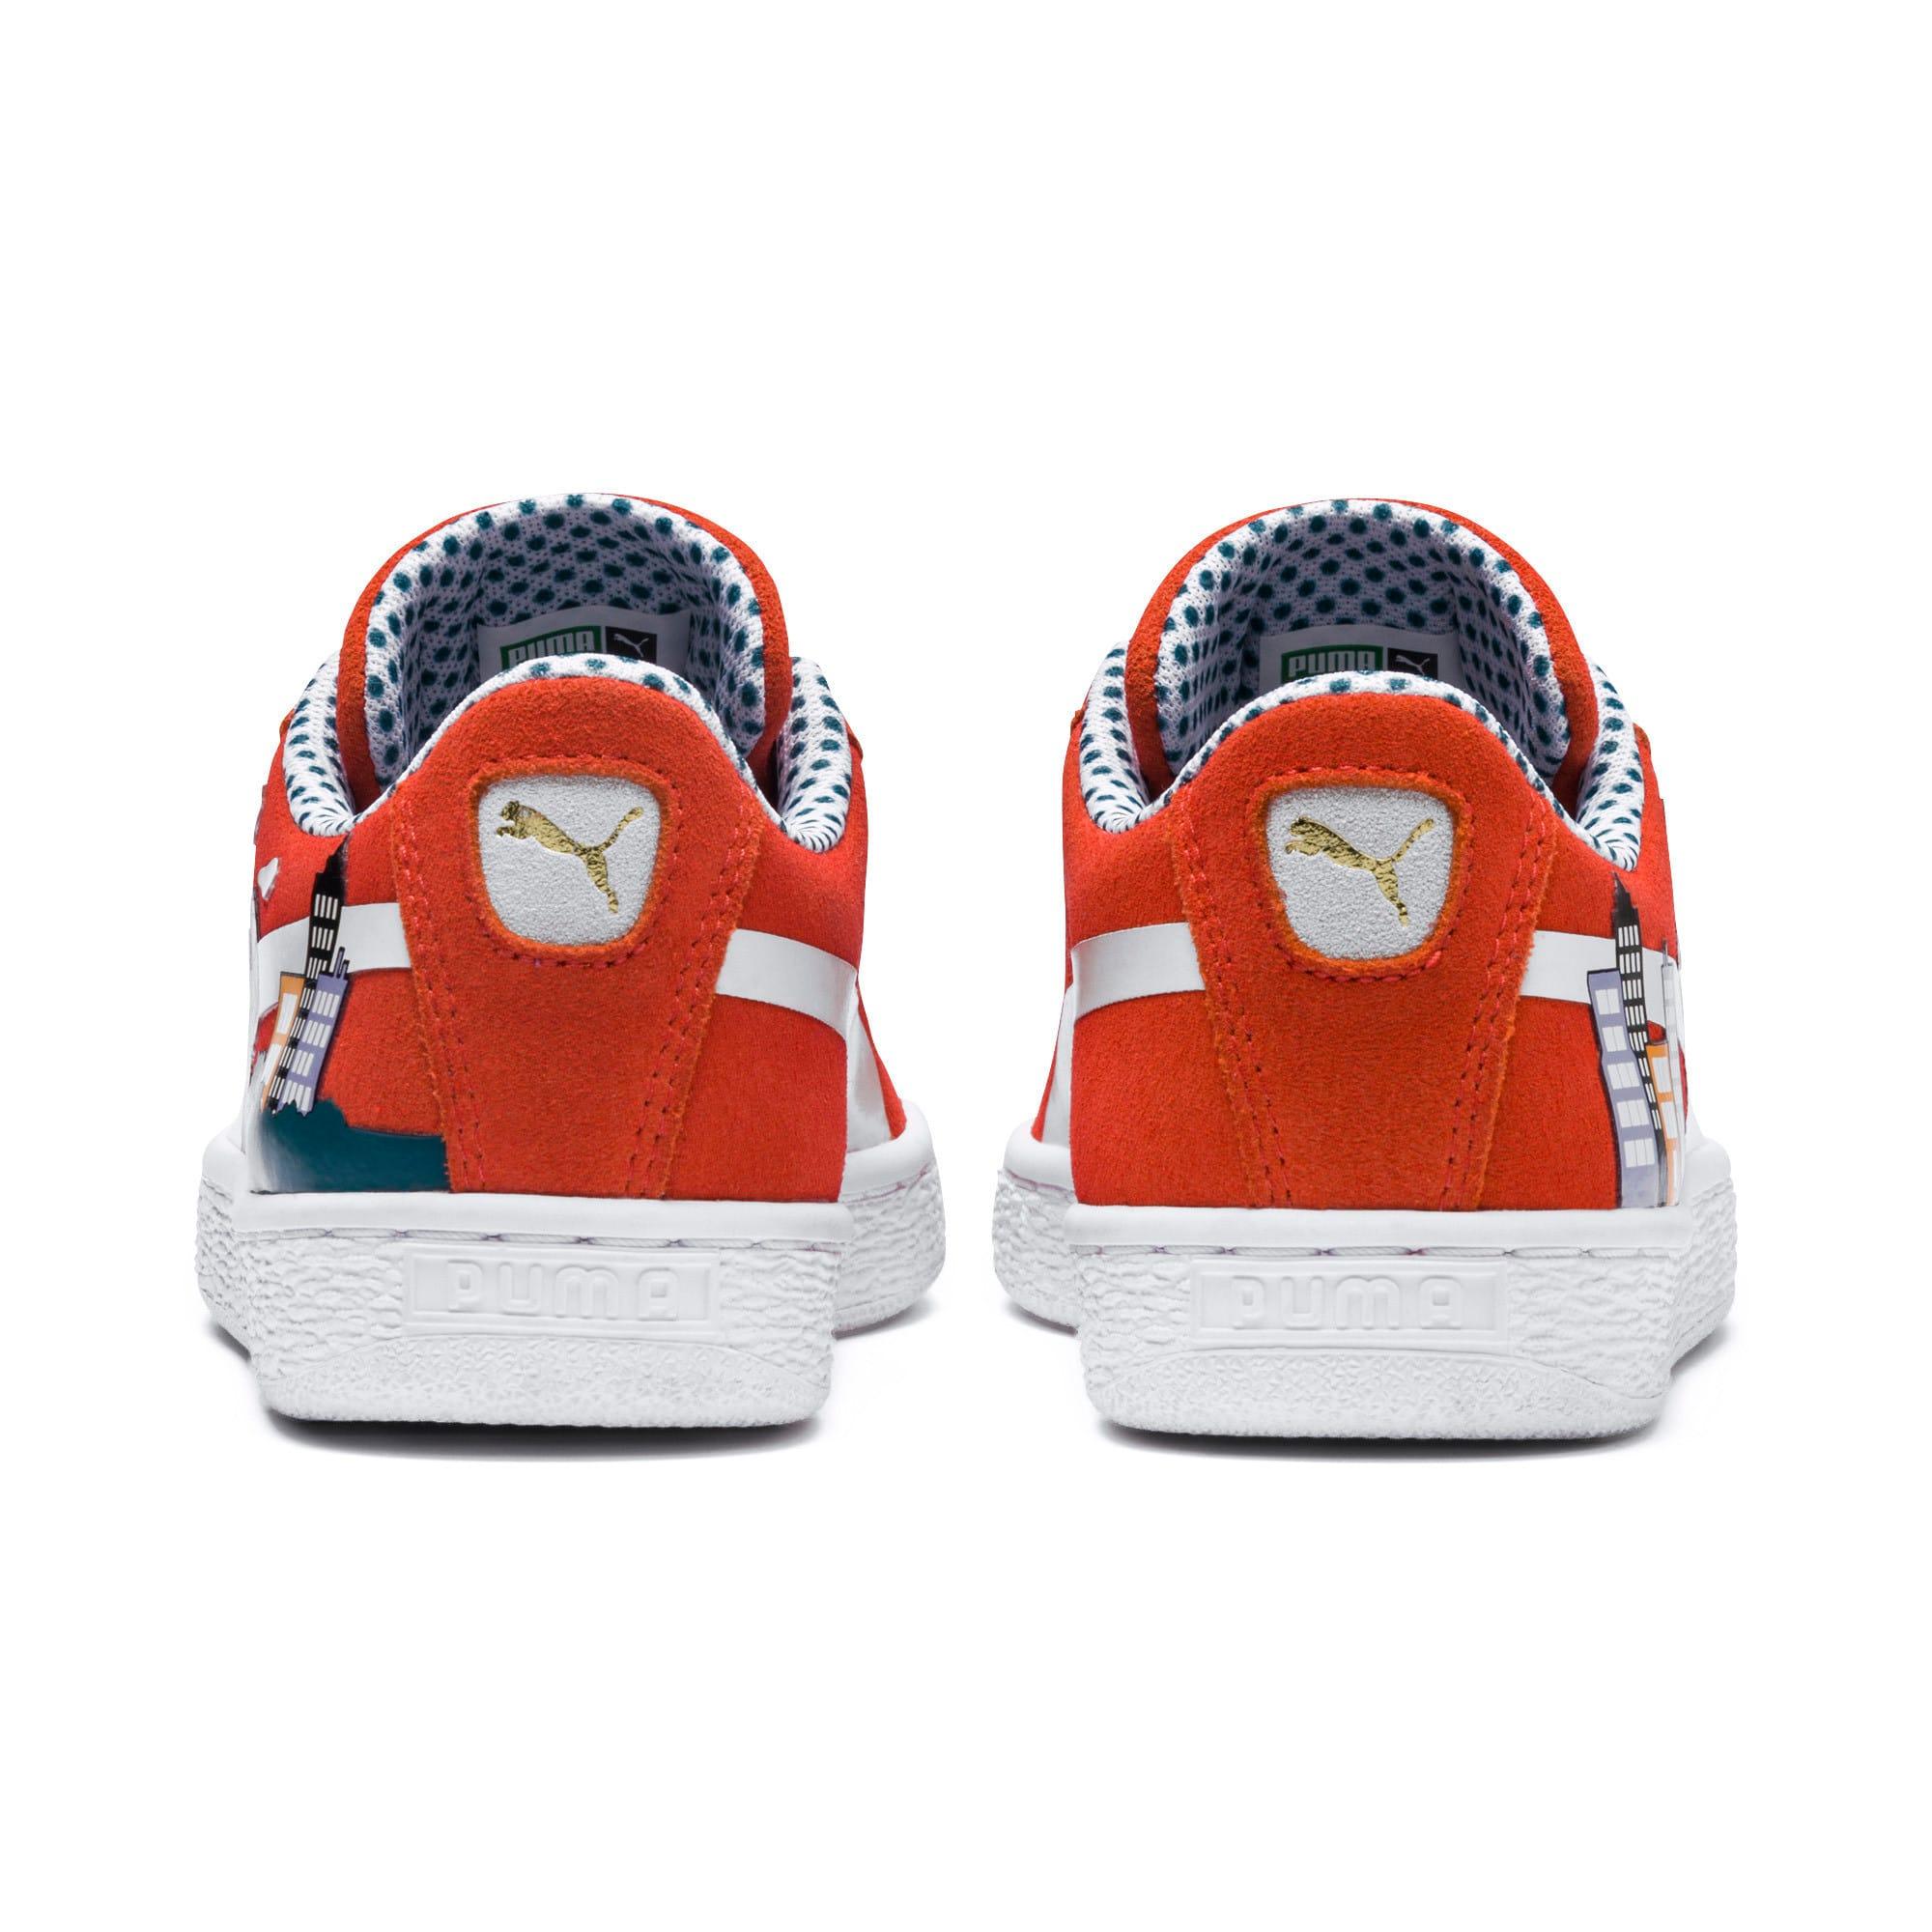 Thumbnail 3 of Sesame Street 50 Suede Sneakers JR, Cherry Tomato-Puma White, medium